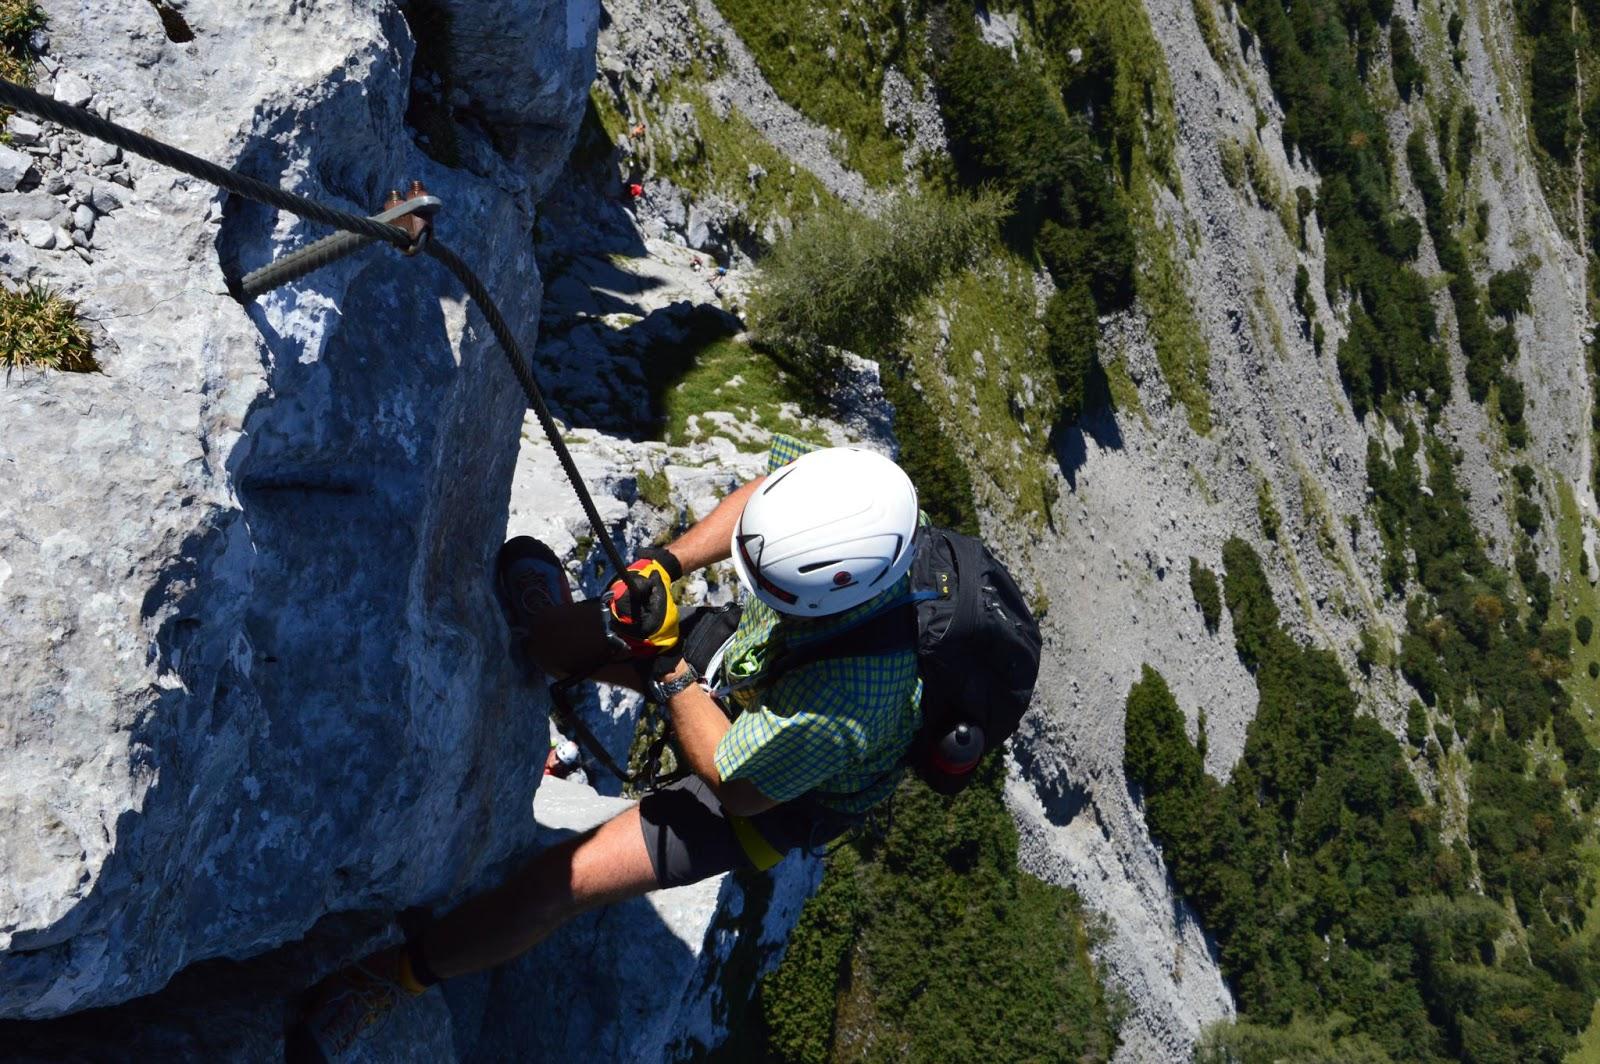 Klettersteig Tajakante : Rauf gehts !: tajakante klettersteig d e